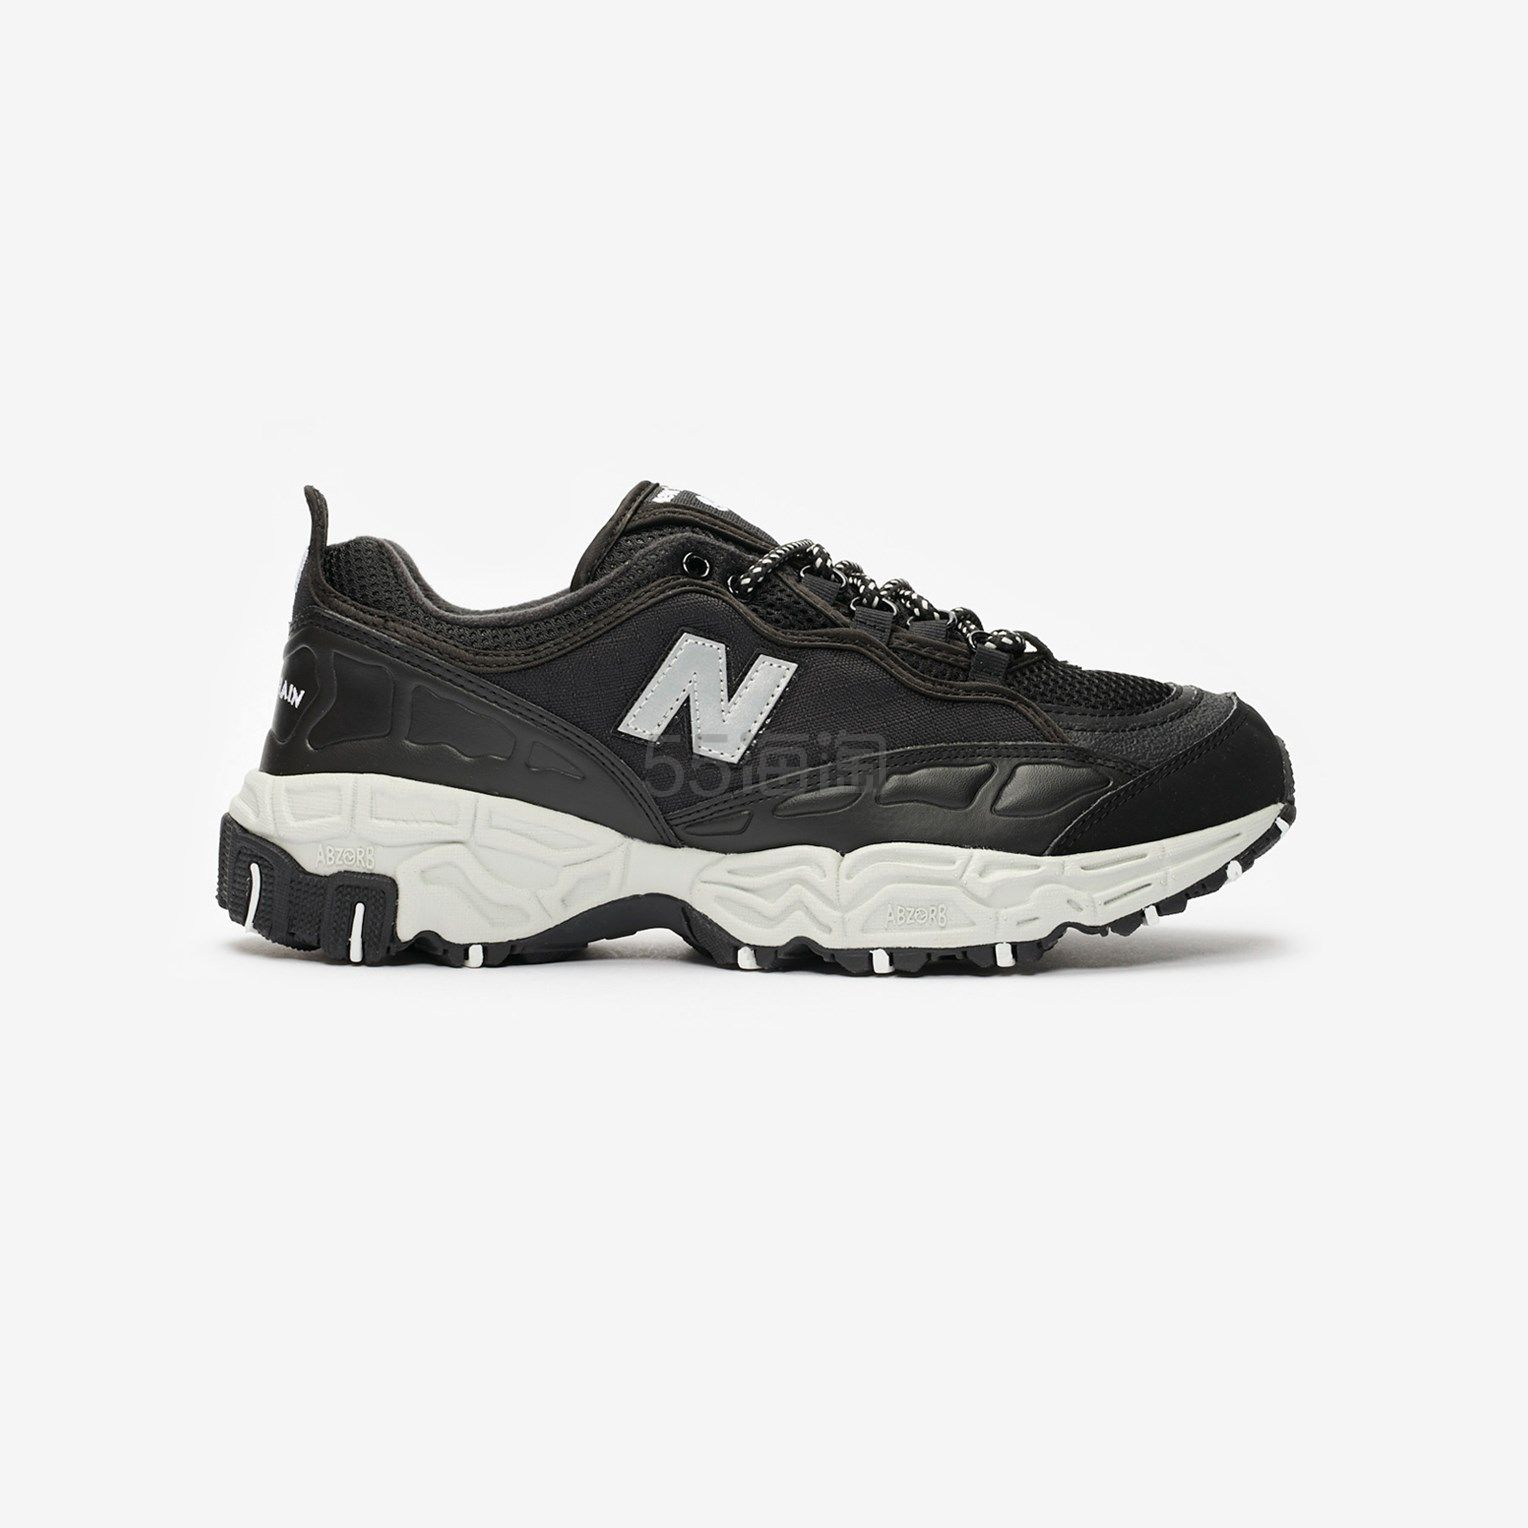 New Balance ML801SA 复古运动鞋老爹鞋 .3(约529元) - 海淘优惠海淘折扣|55海淘网